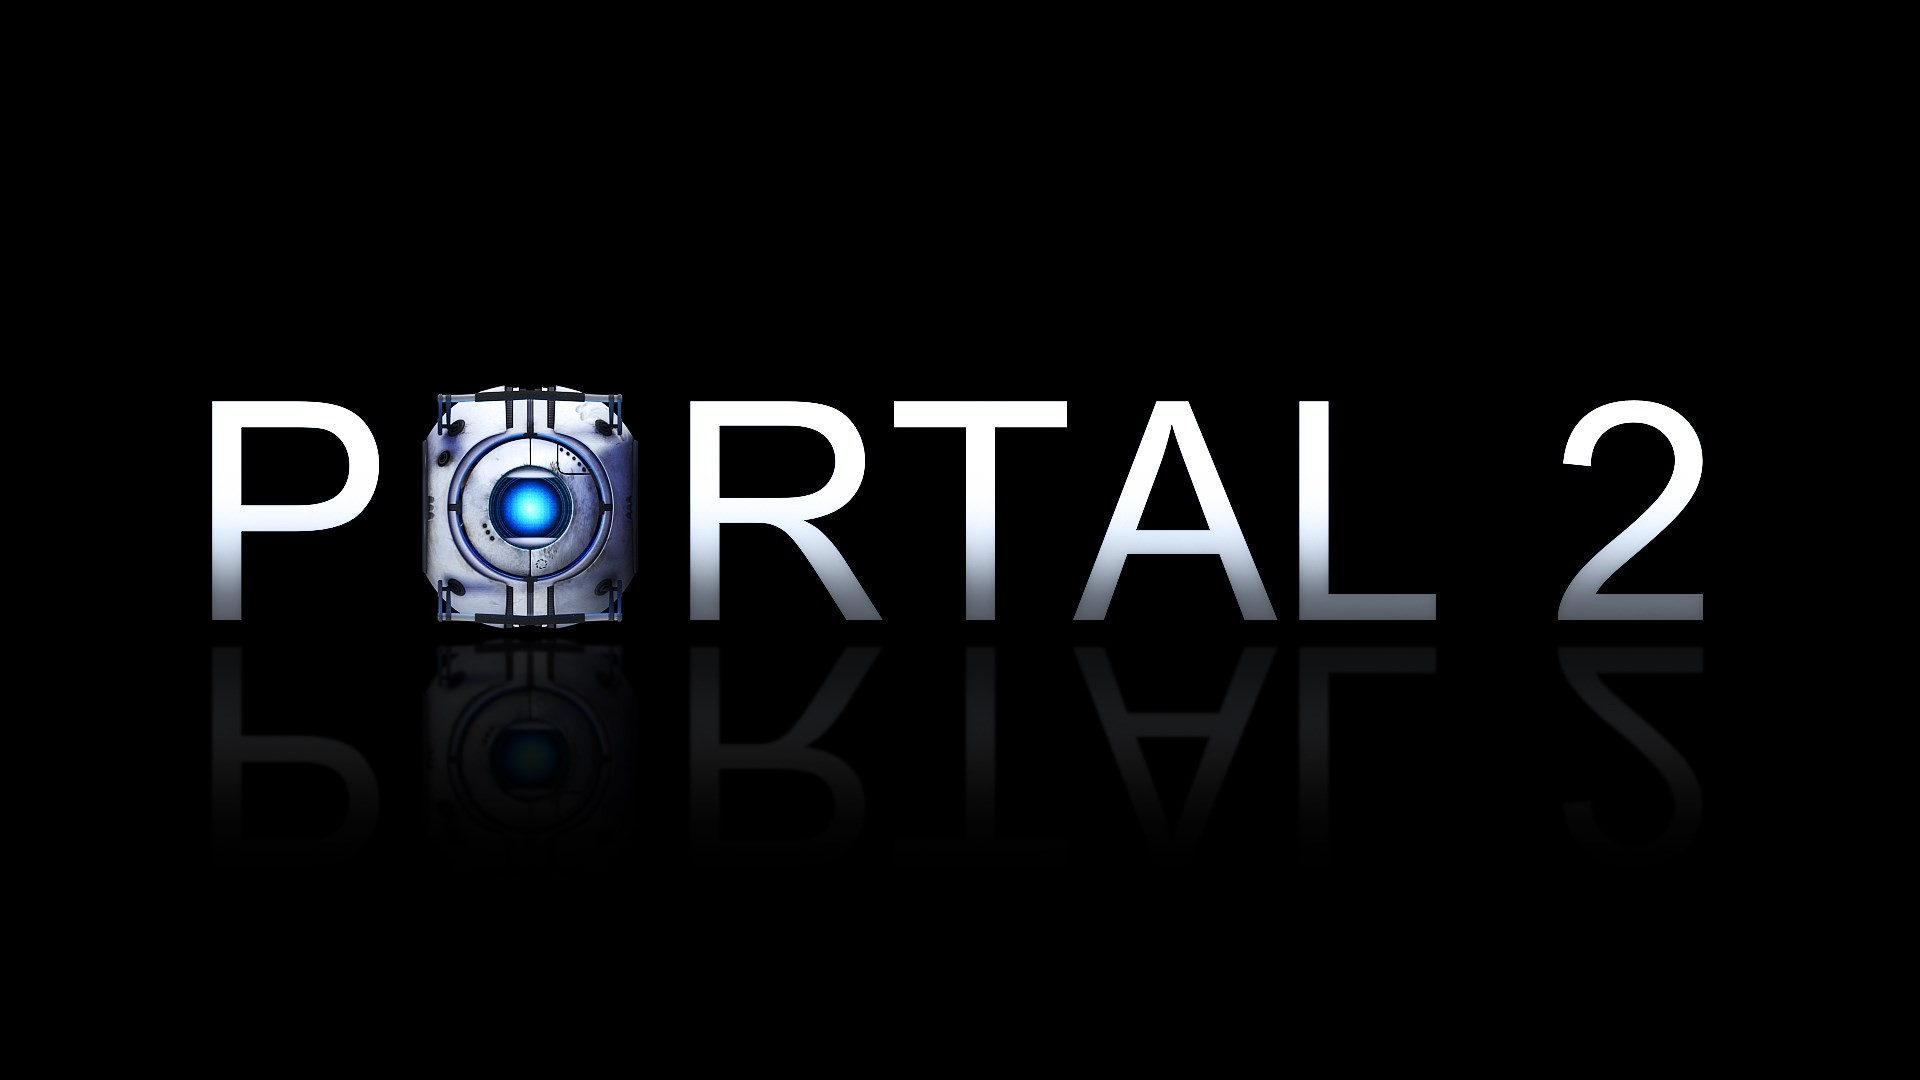 portal 2 – Background hd